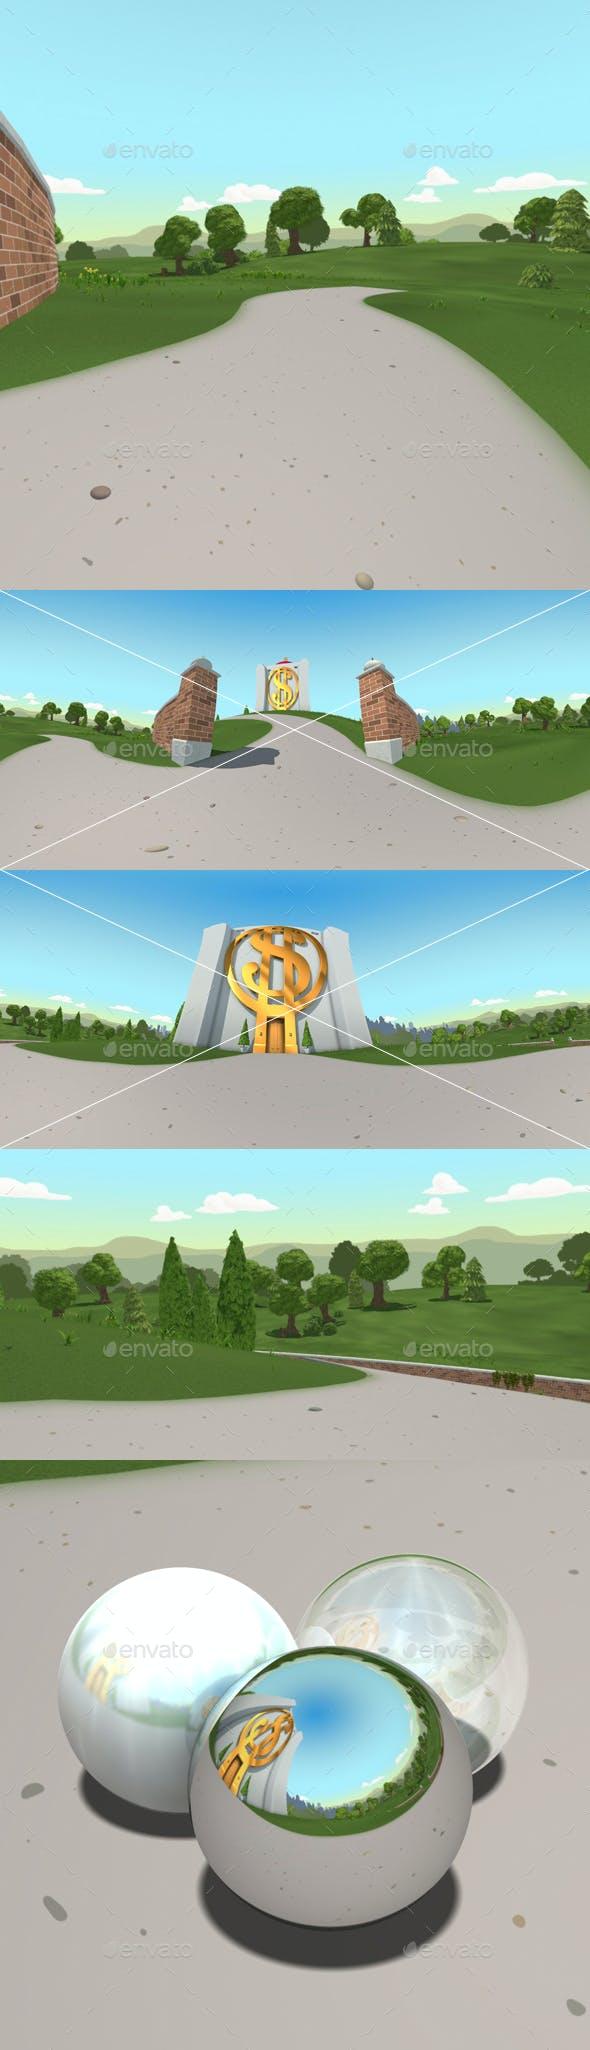 2 Cartoon Bank Exterior Hdri By Lucky Fingers 3docean